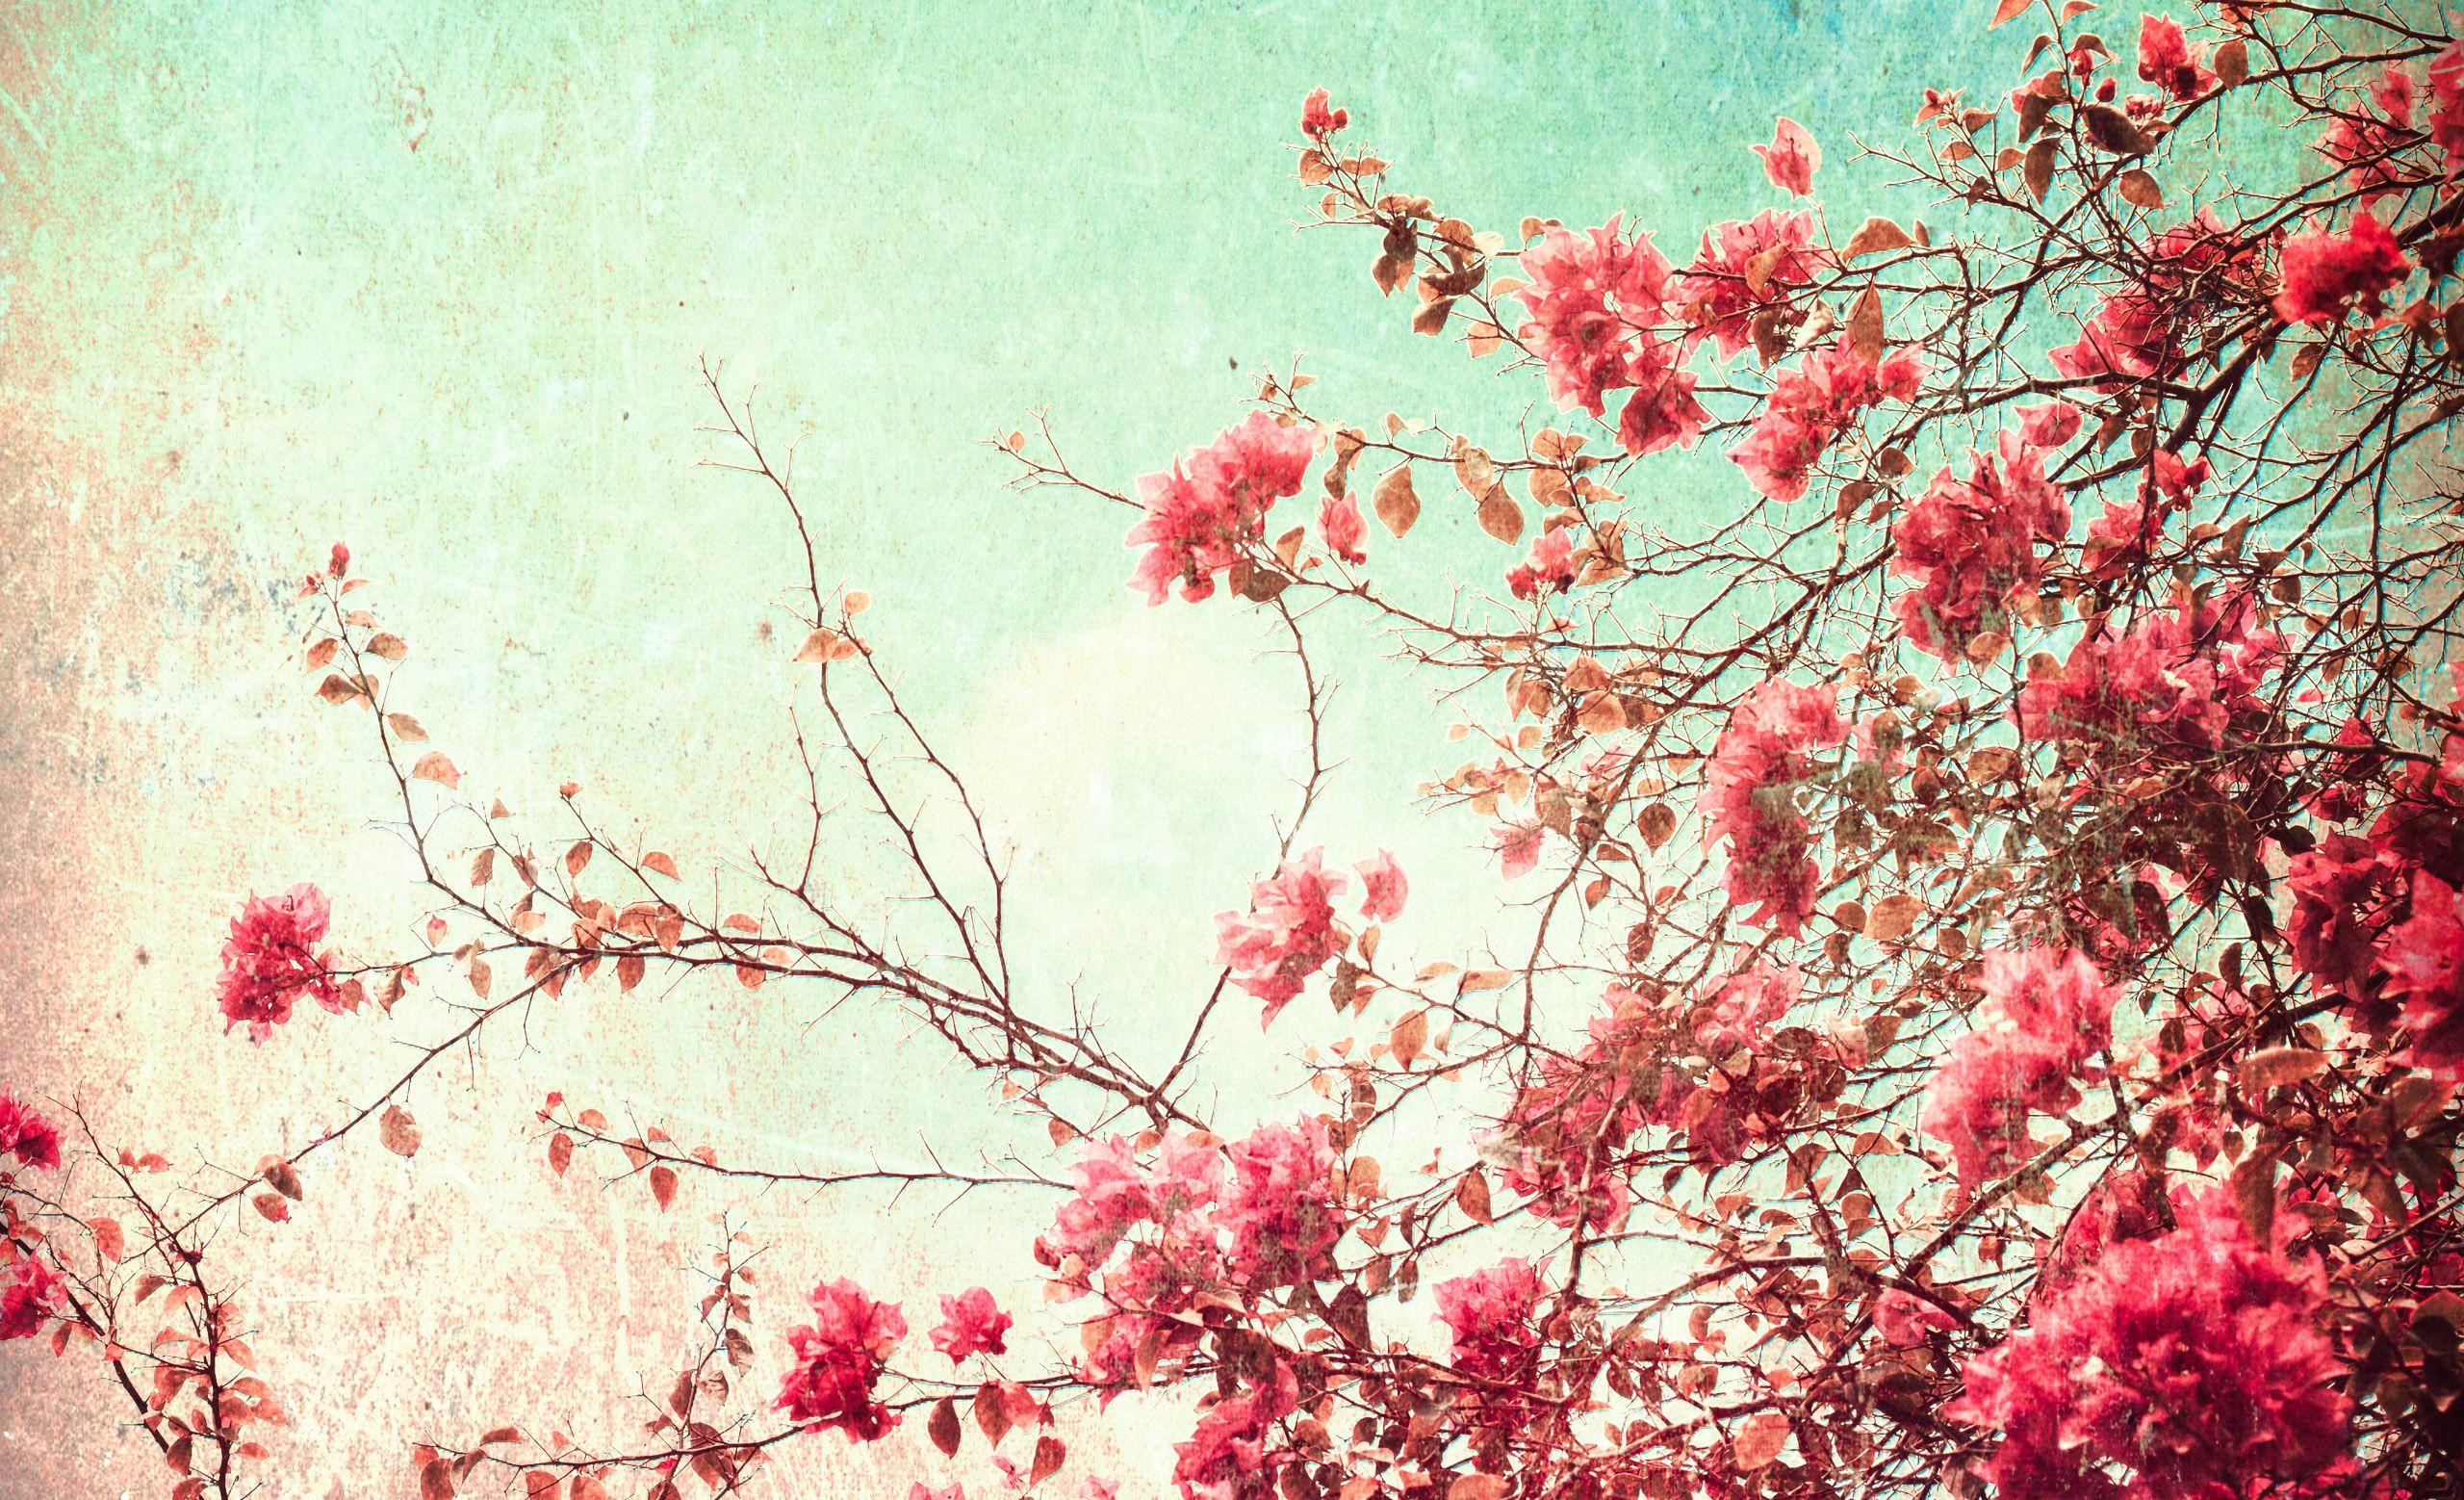 Vintage Wallpaper Spring Time per meter